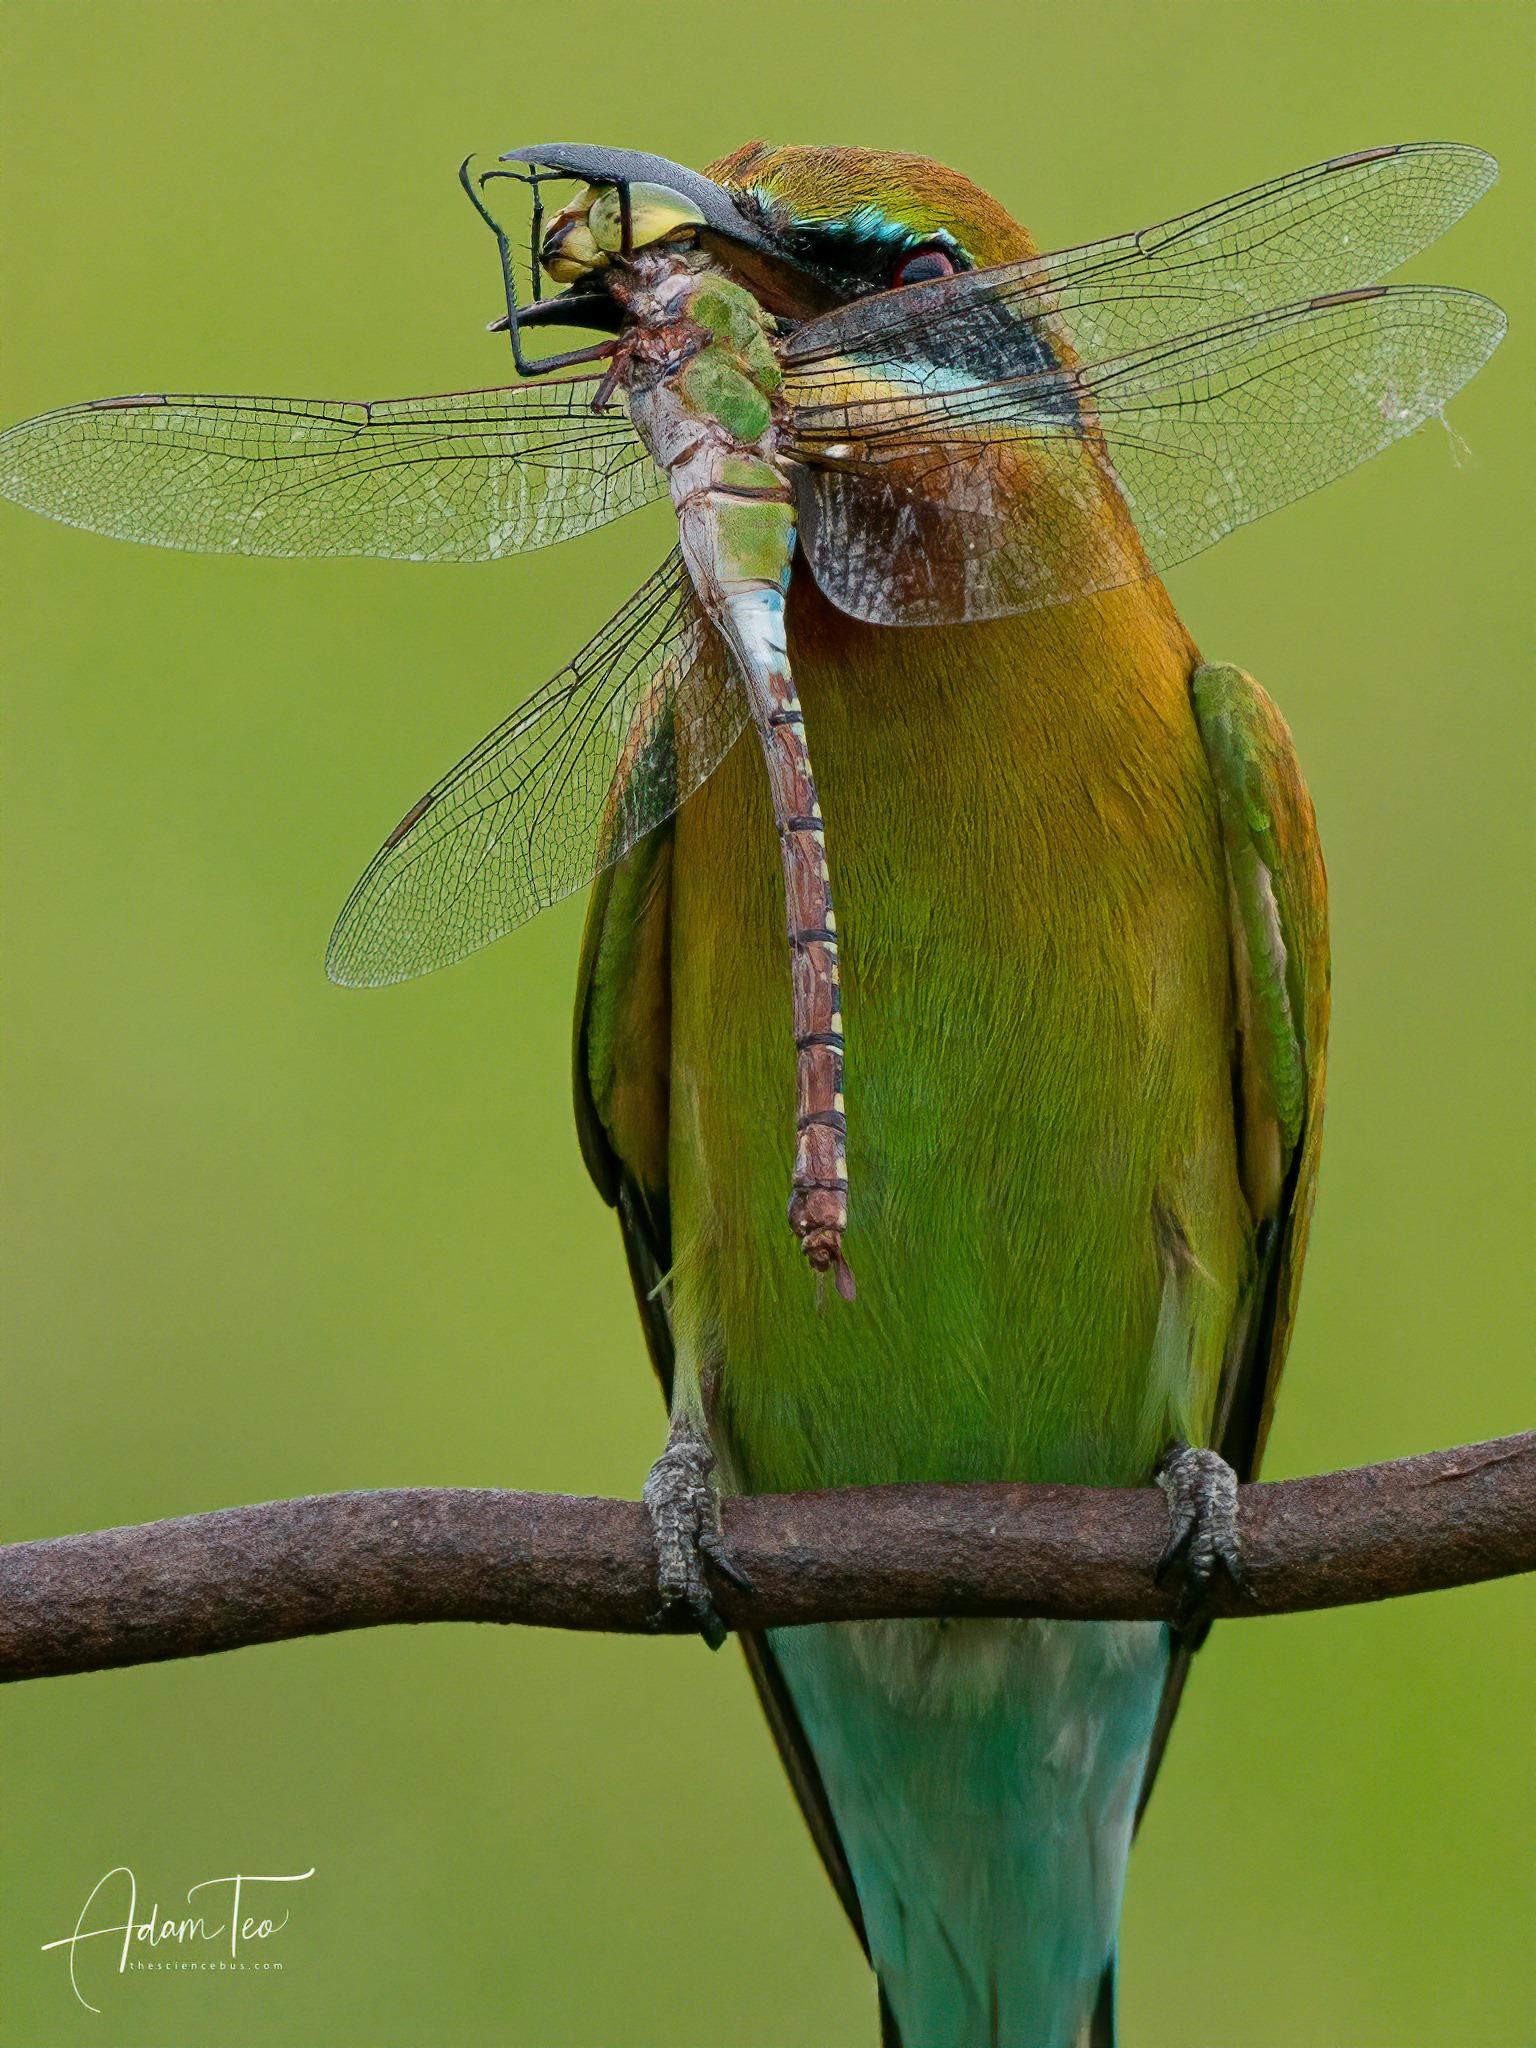 Птица поймала стрекозу